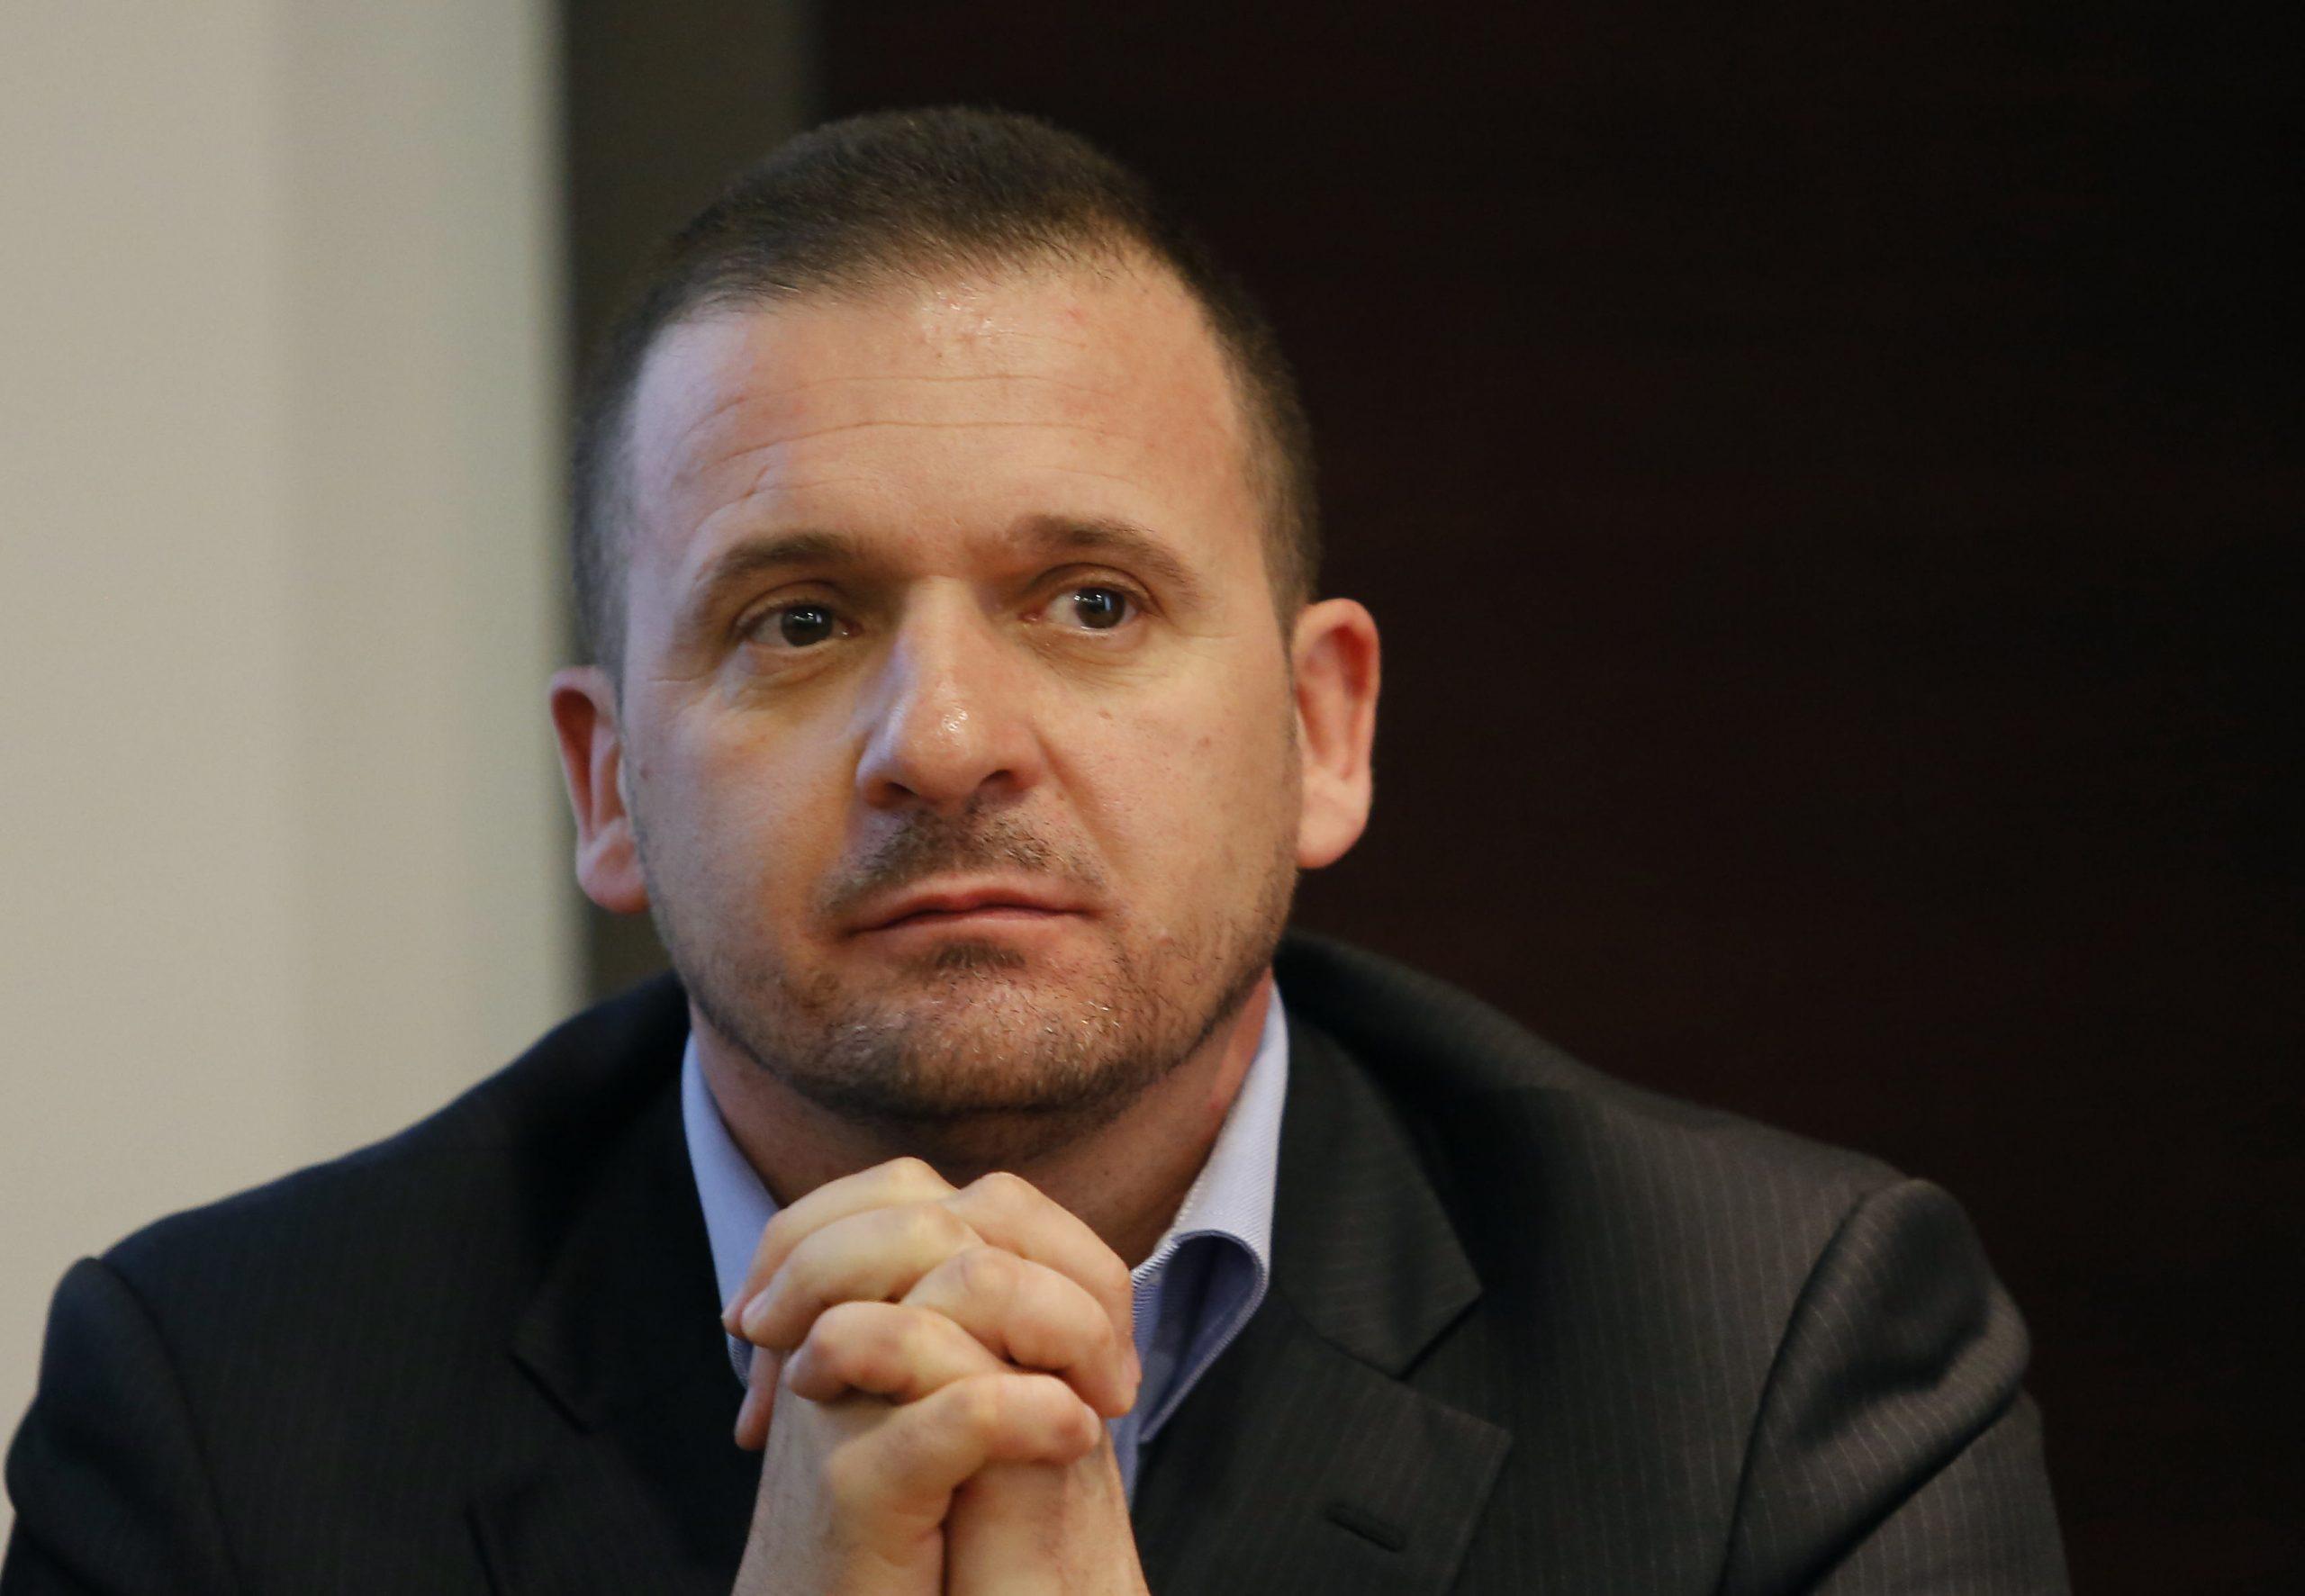 Predrag Mijatović zamišljeno gleda